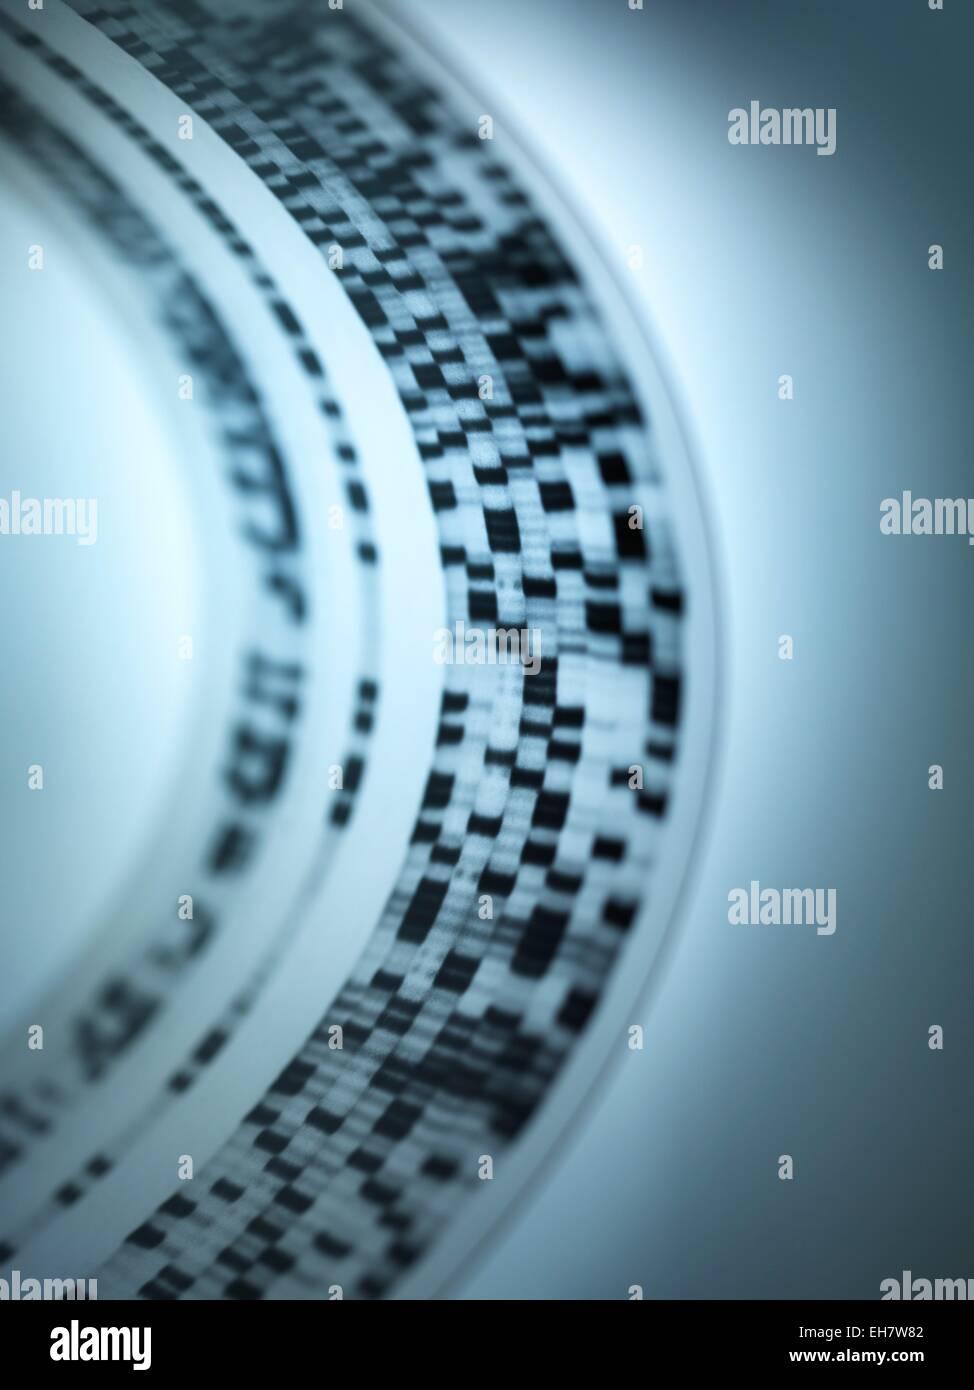 Recherche sur l'ADN Photo Stock